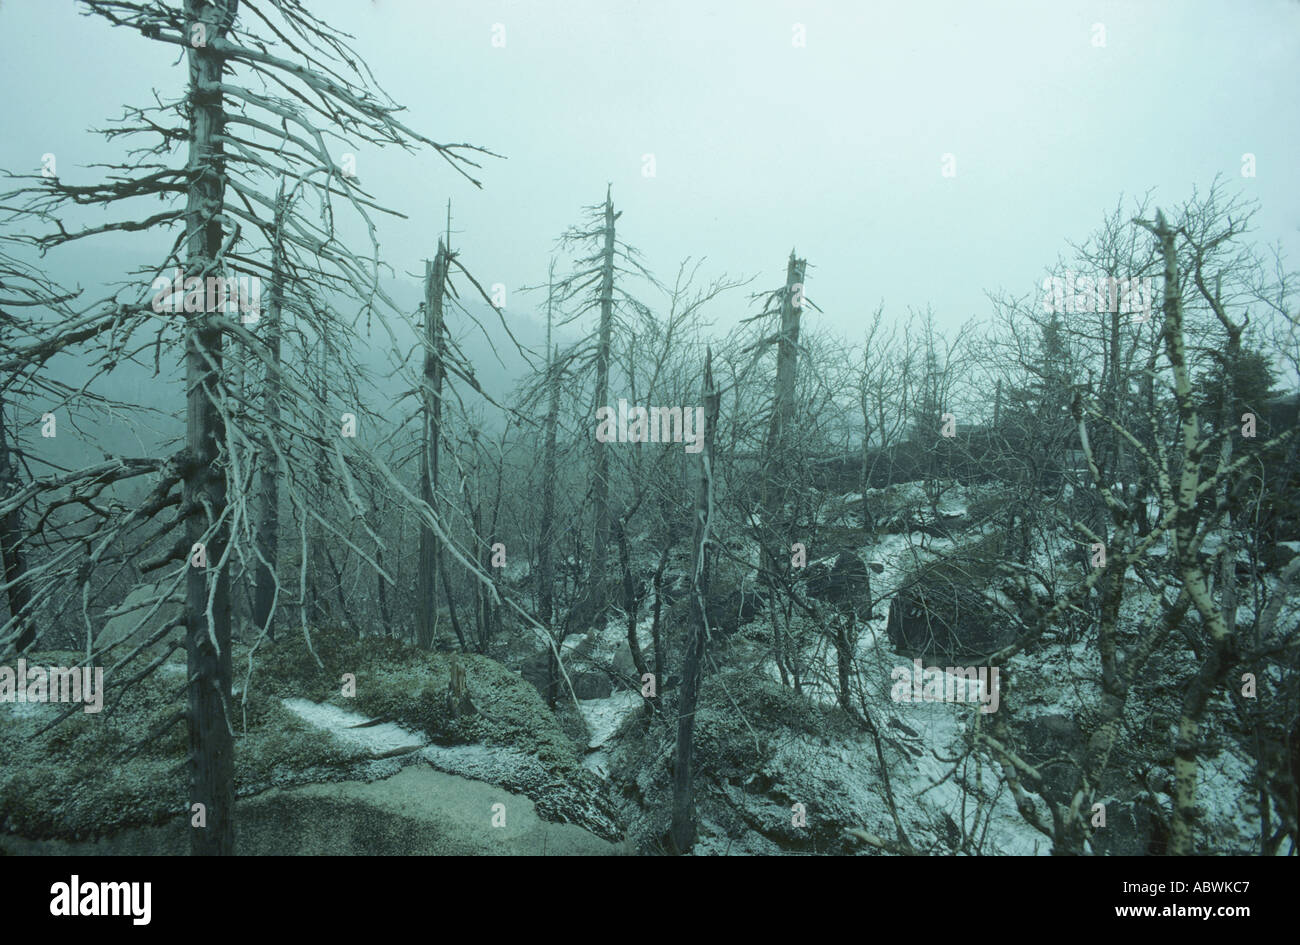 hight resolution of acid rain kills spruce forest europe stock image